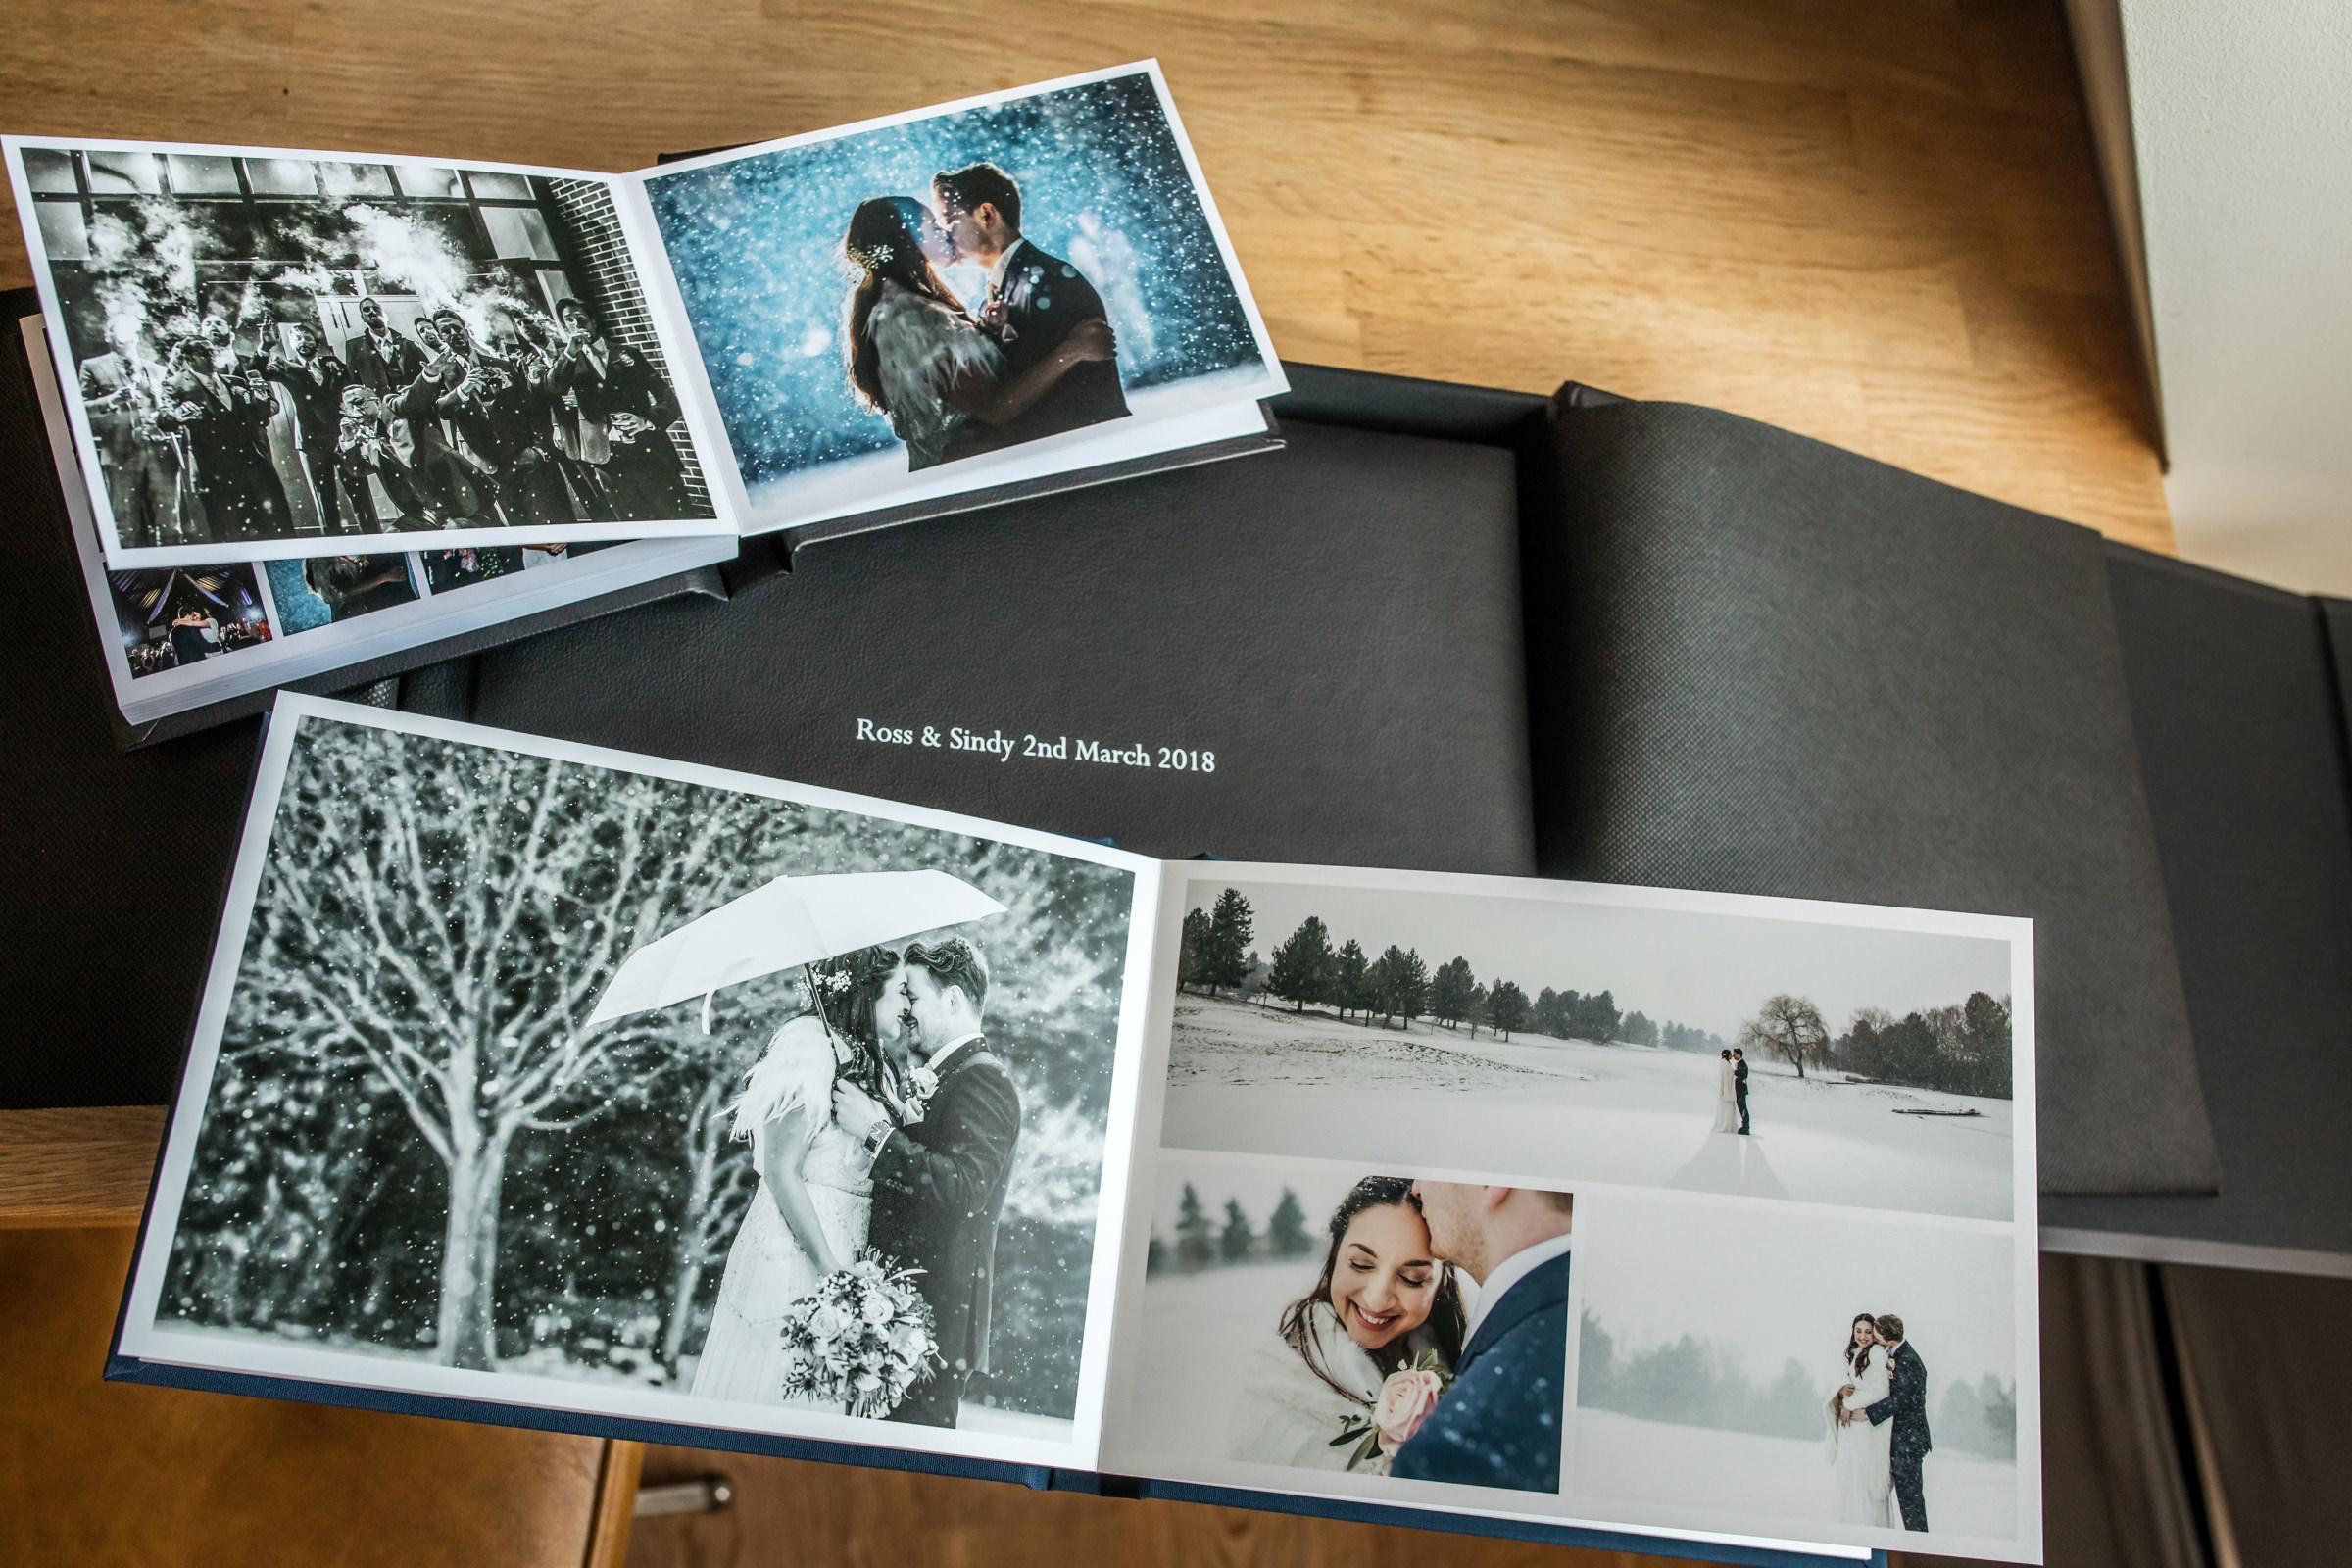 wedding album hitchin hertfordshire wedding photographer rafe abrook photography-1000.jpg